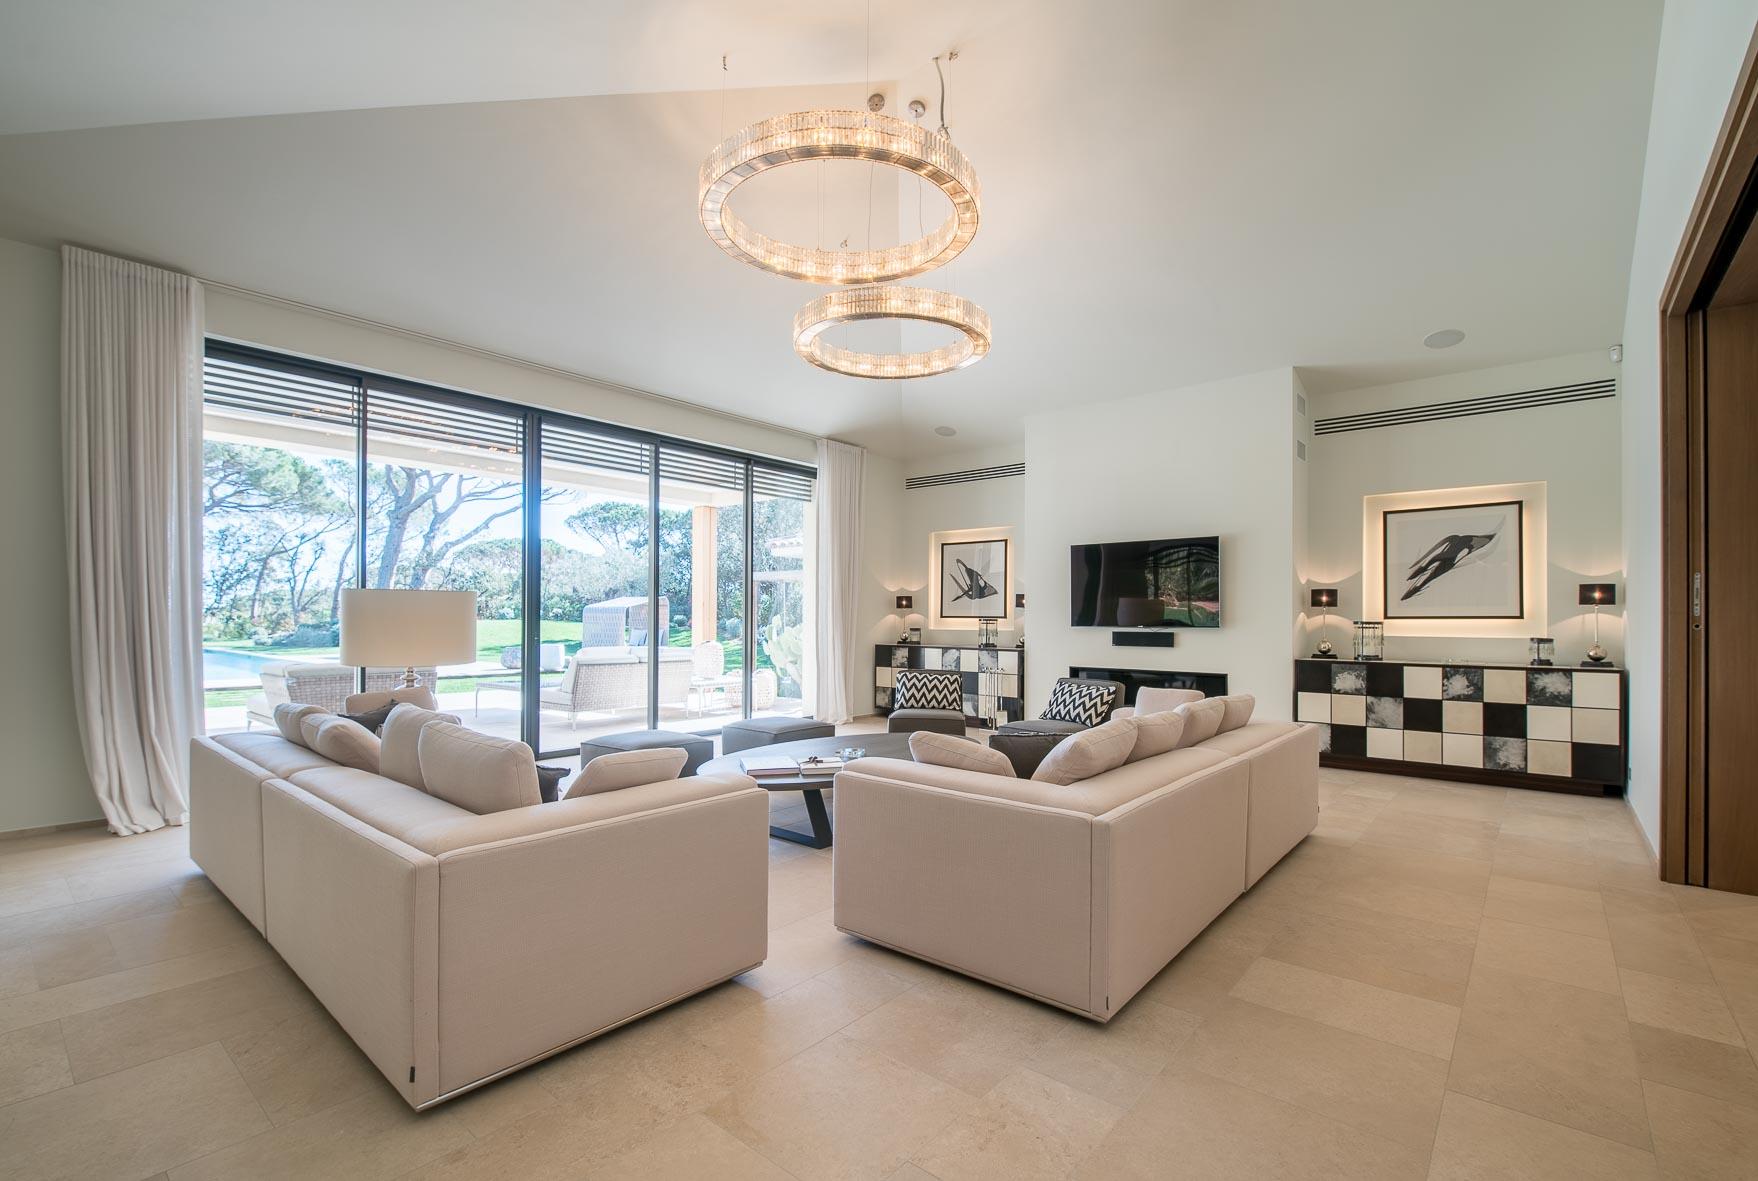 villa rental Saint Tropez 19